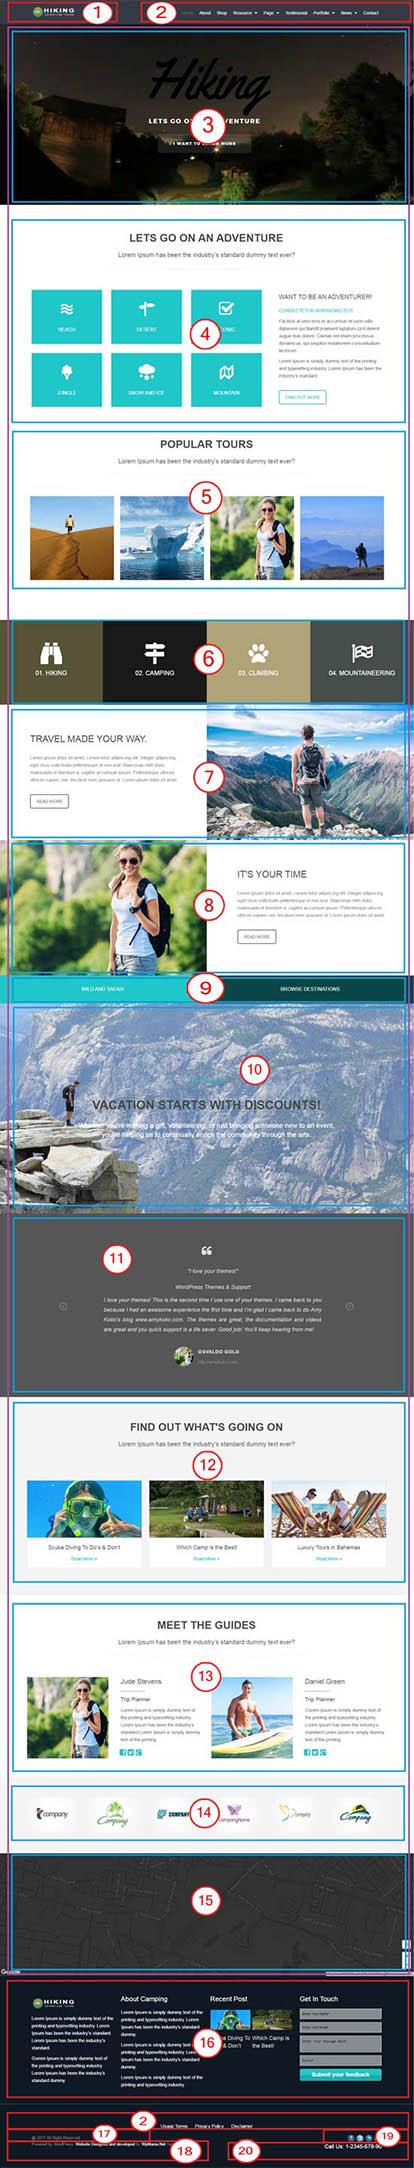 Hiking WordPress Theme – Adventure, Tours & Travel Website Template Documentation